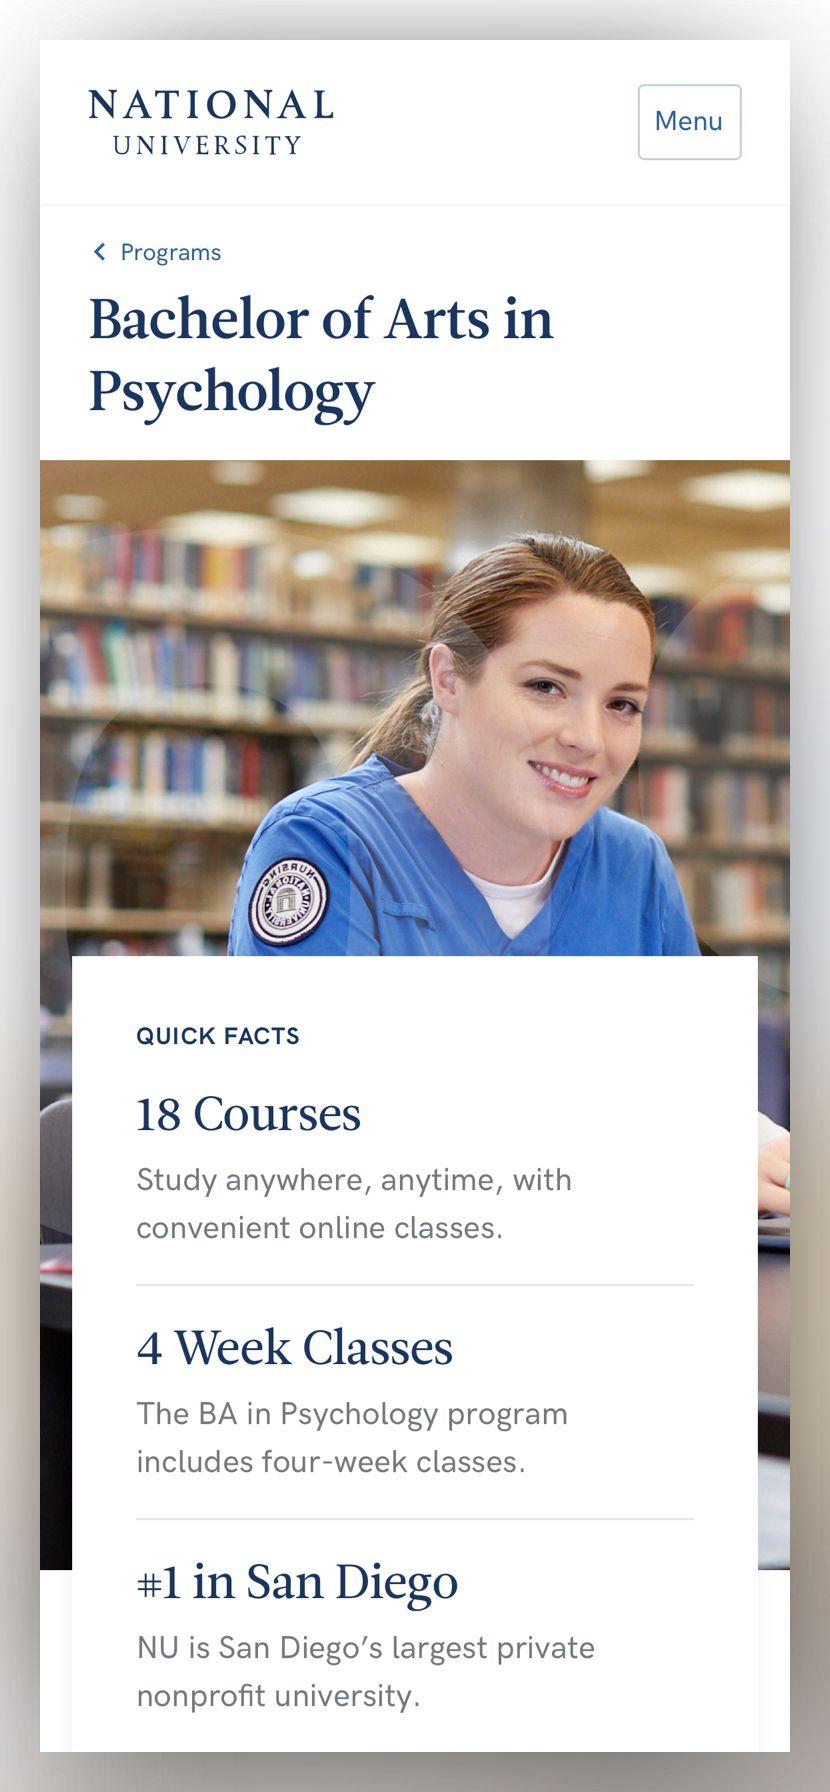 screenshot of a National University single program page at phone size